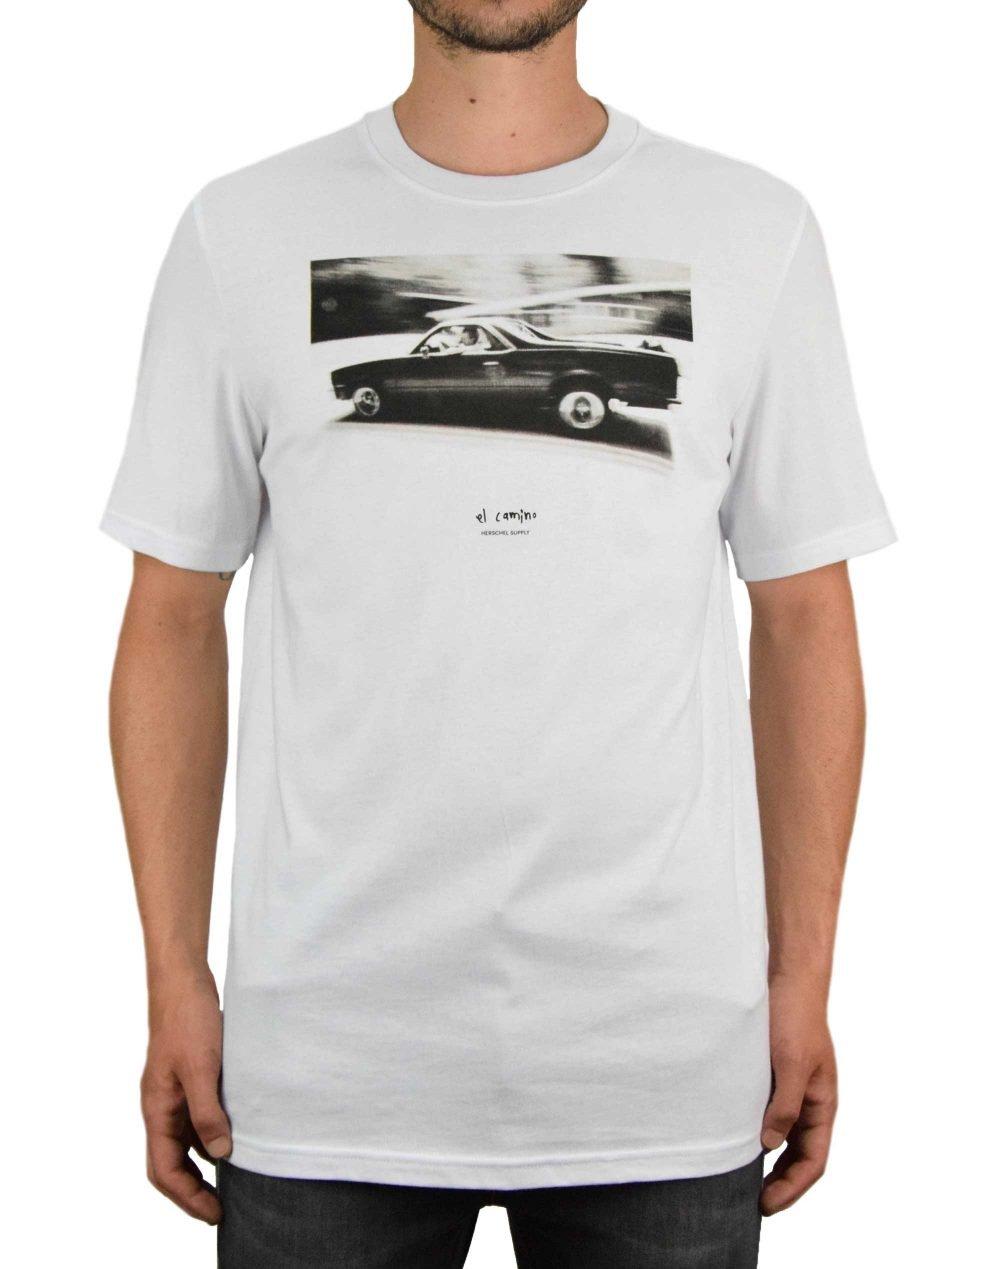 Herschel Supply Co Men's El Camino Tee (50027-00563) Bright White